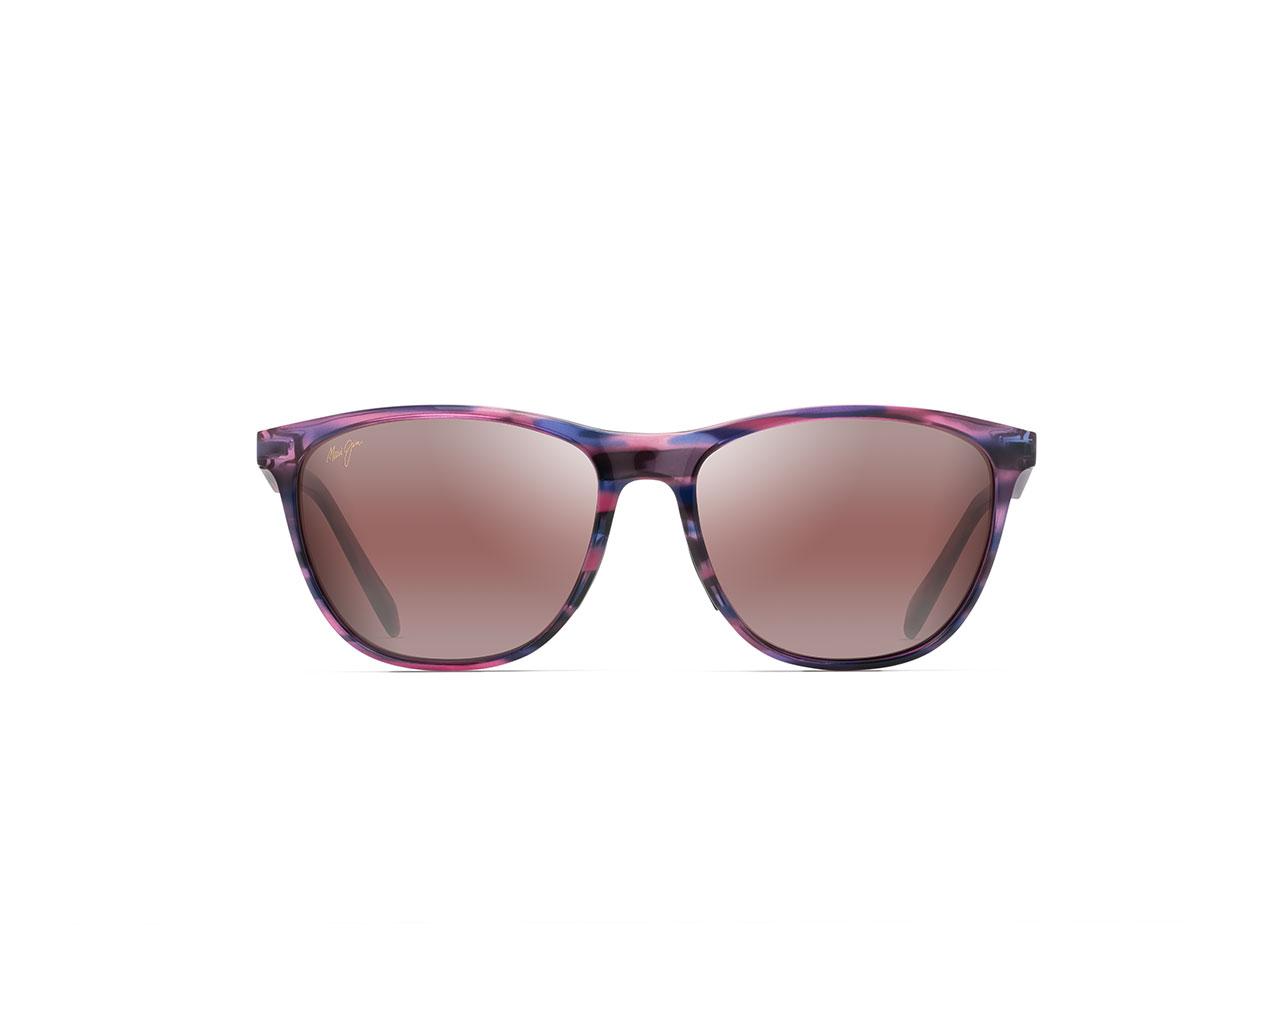 45e84c3c42 Sugar Cane – Style # 783 – Lilac Sunset